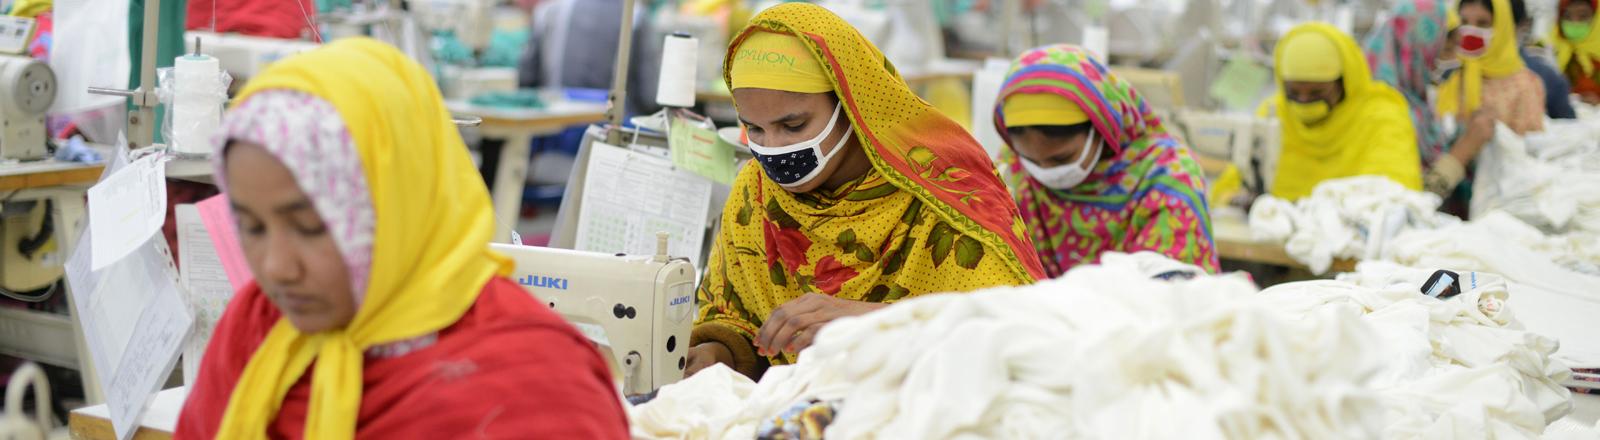 Textilfabrik Epyllion in Dhaka, Bangladesch.